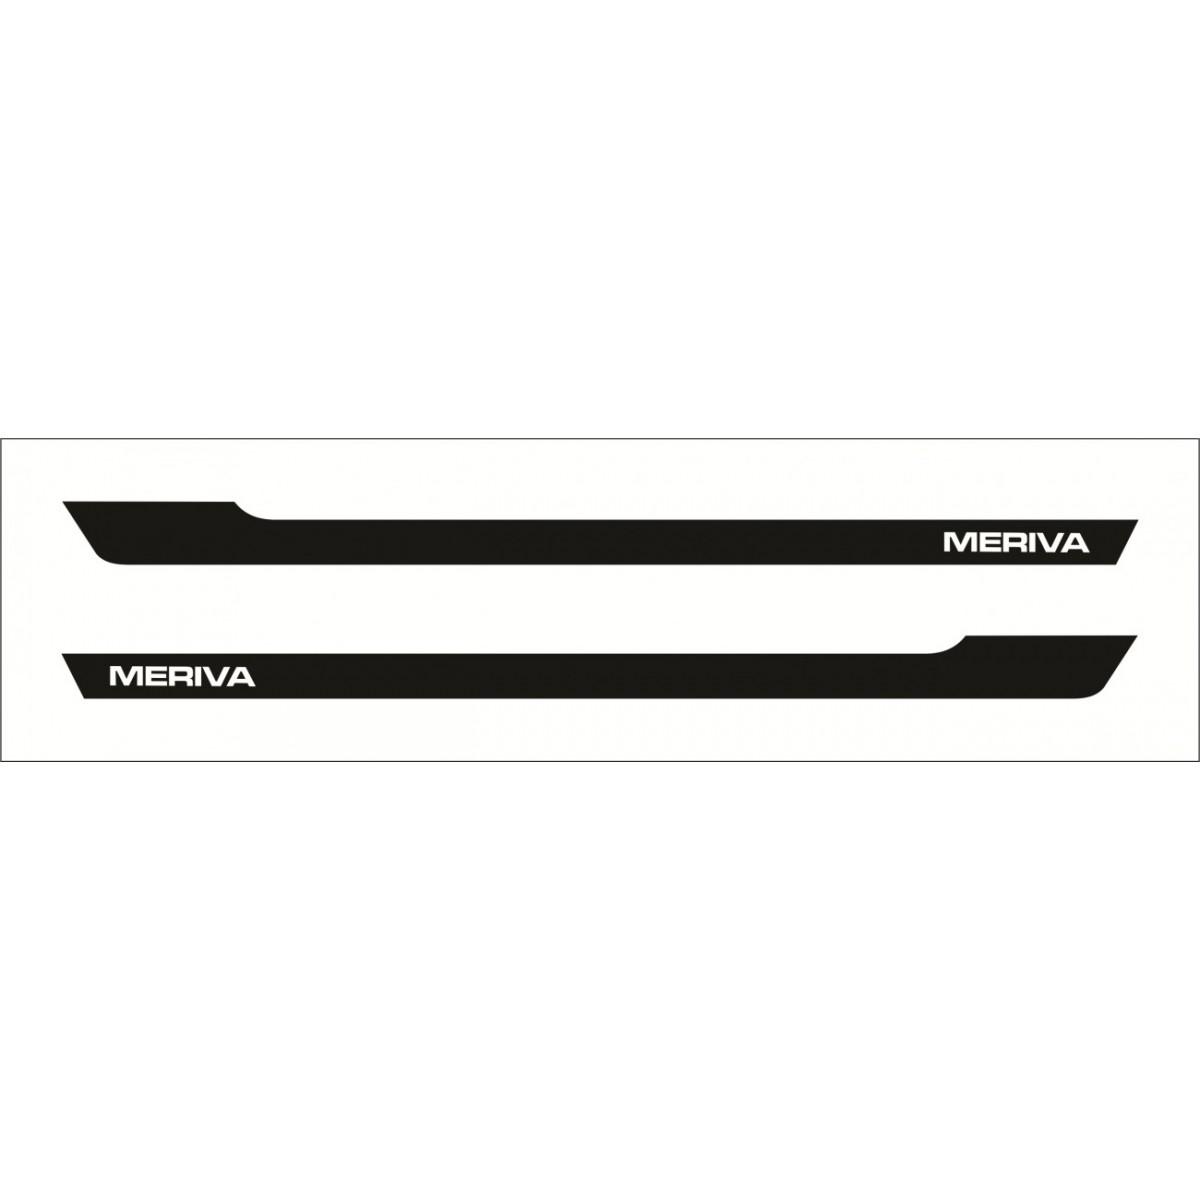 Adesivo Chevrolet Meriva Faixa Lateral 3m Mr006